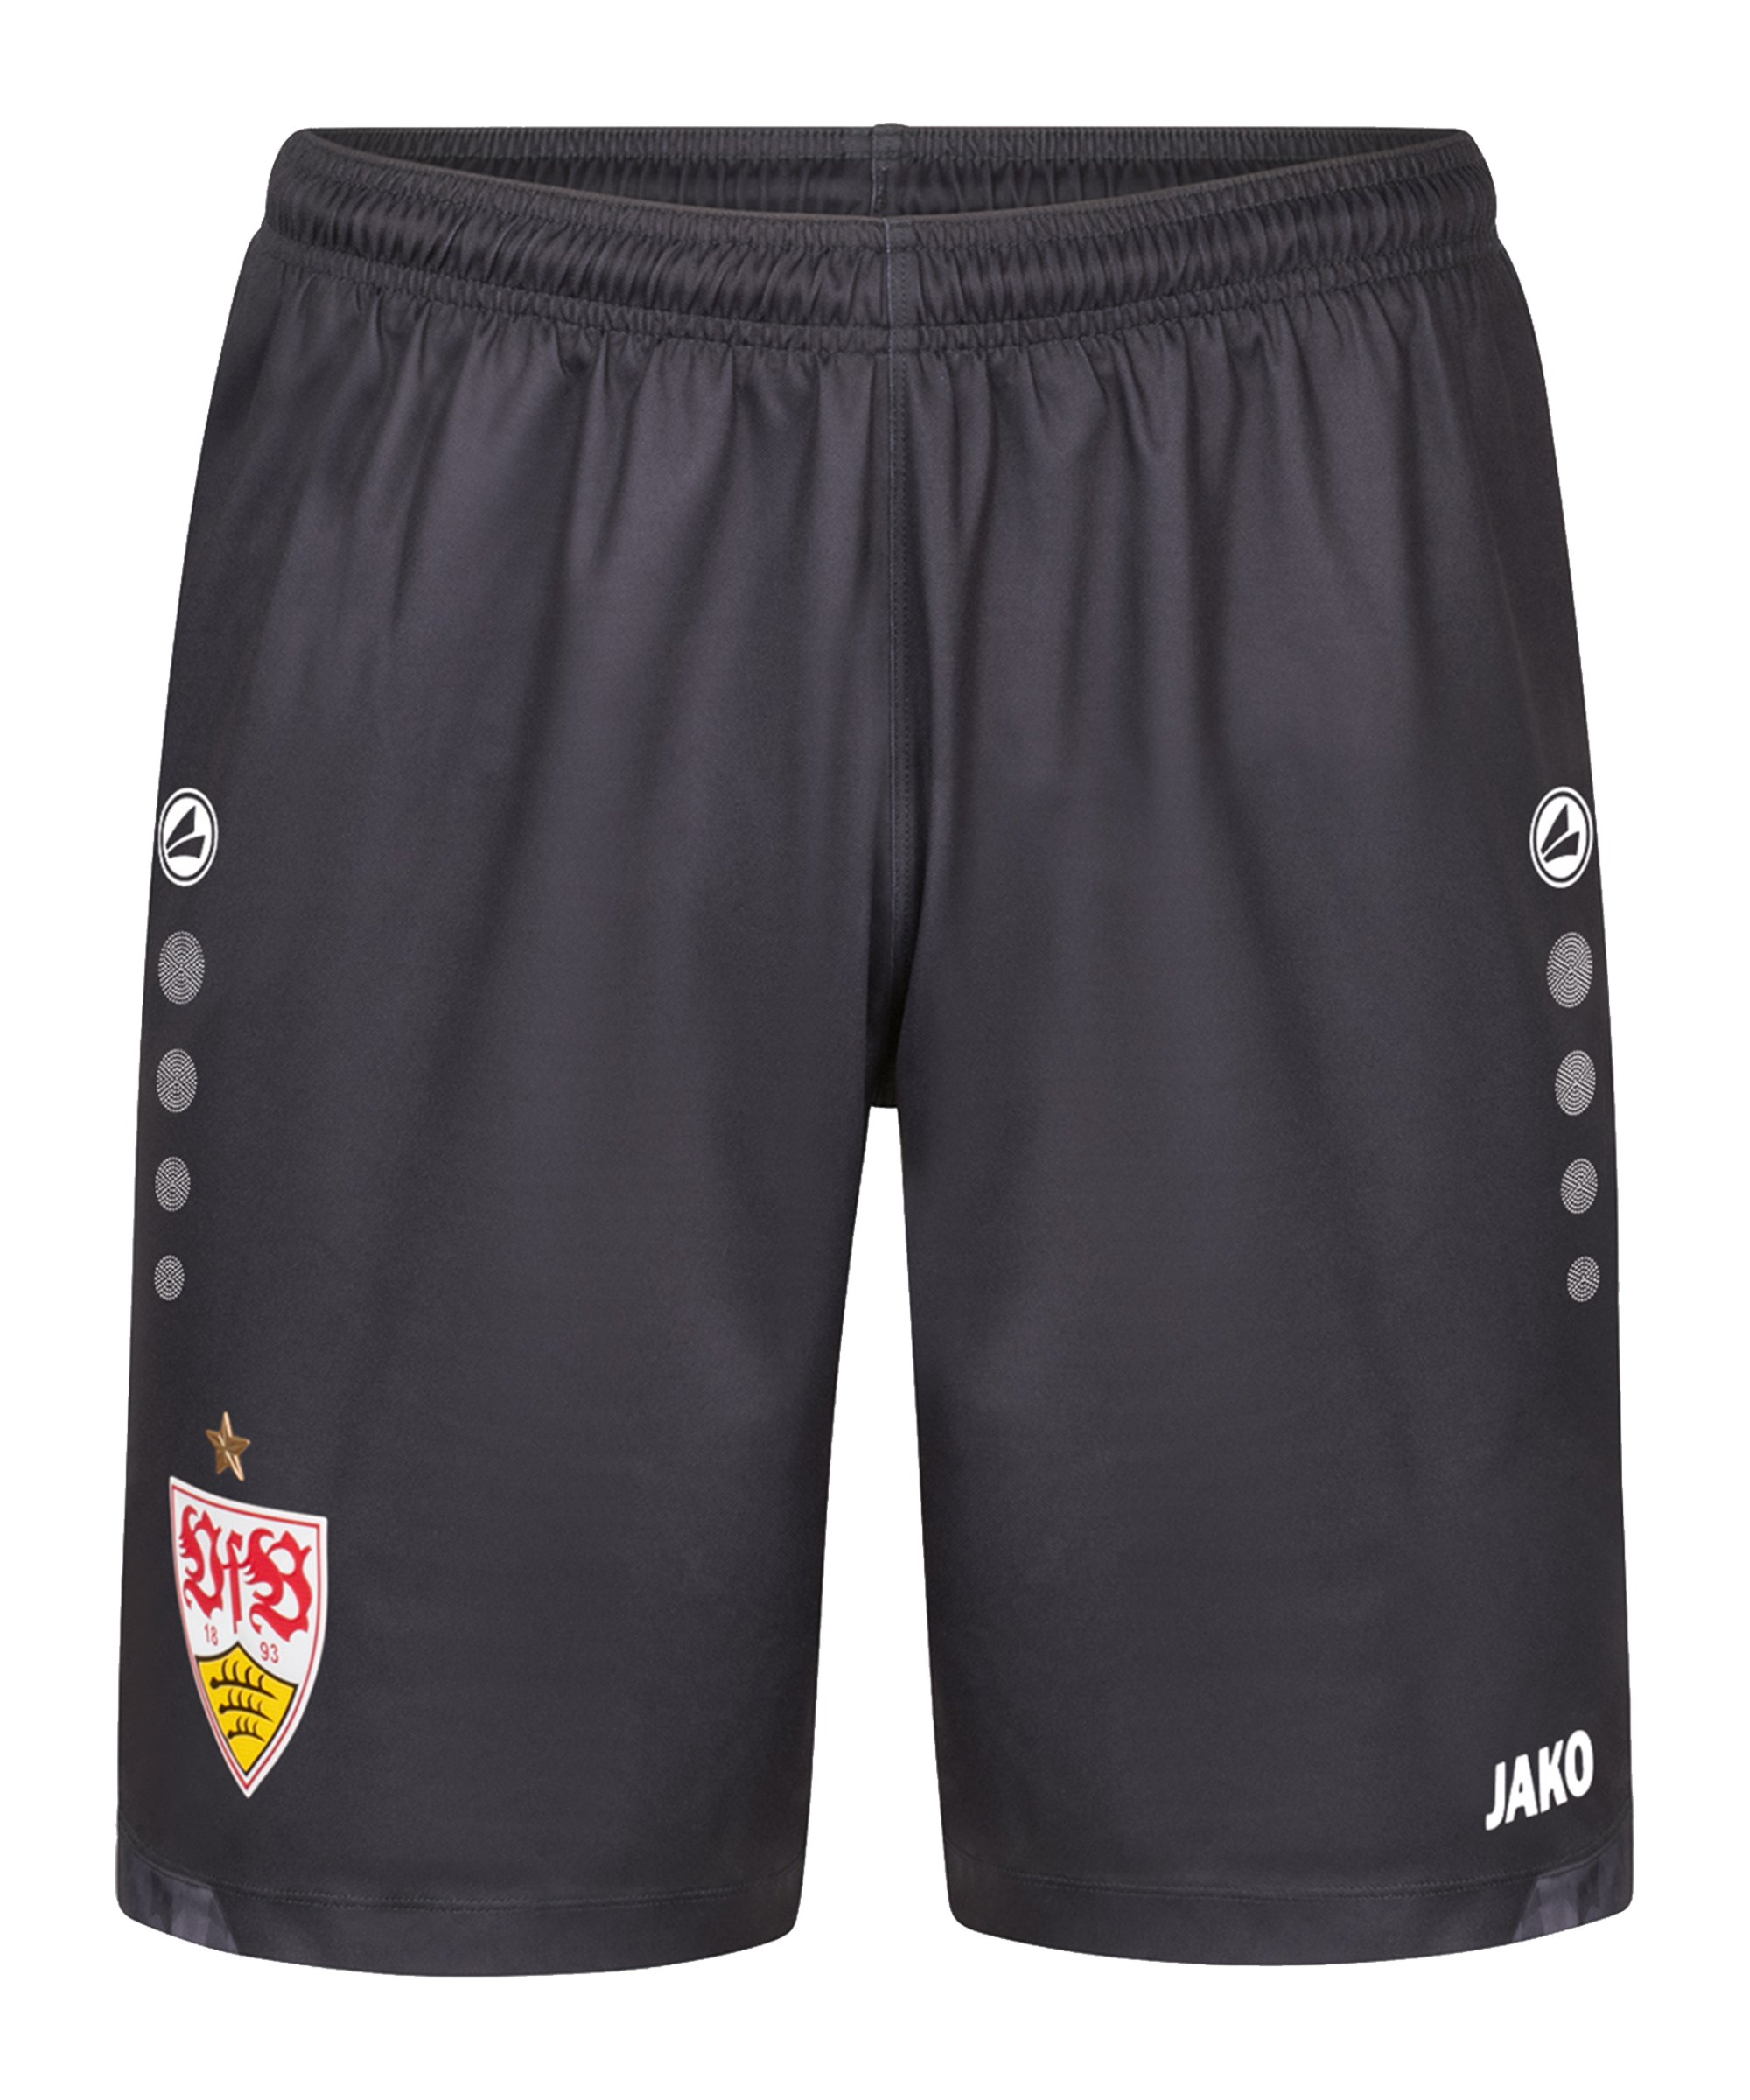 JAKO VfB Stuttgart Short 3rd 2021/2022 Grau F830 - grau